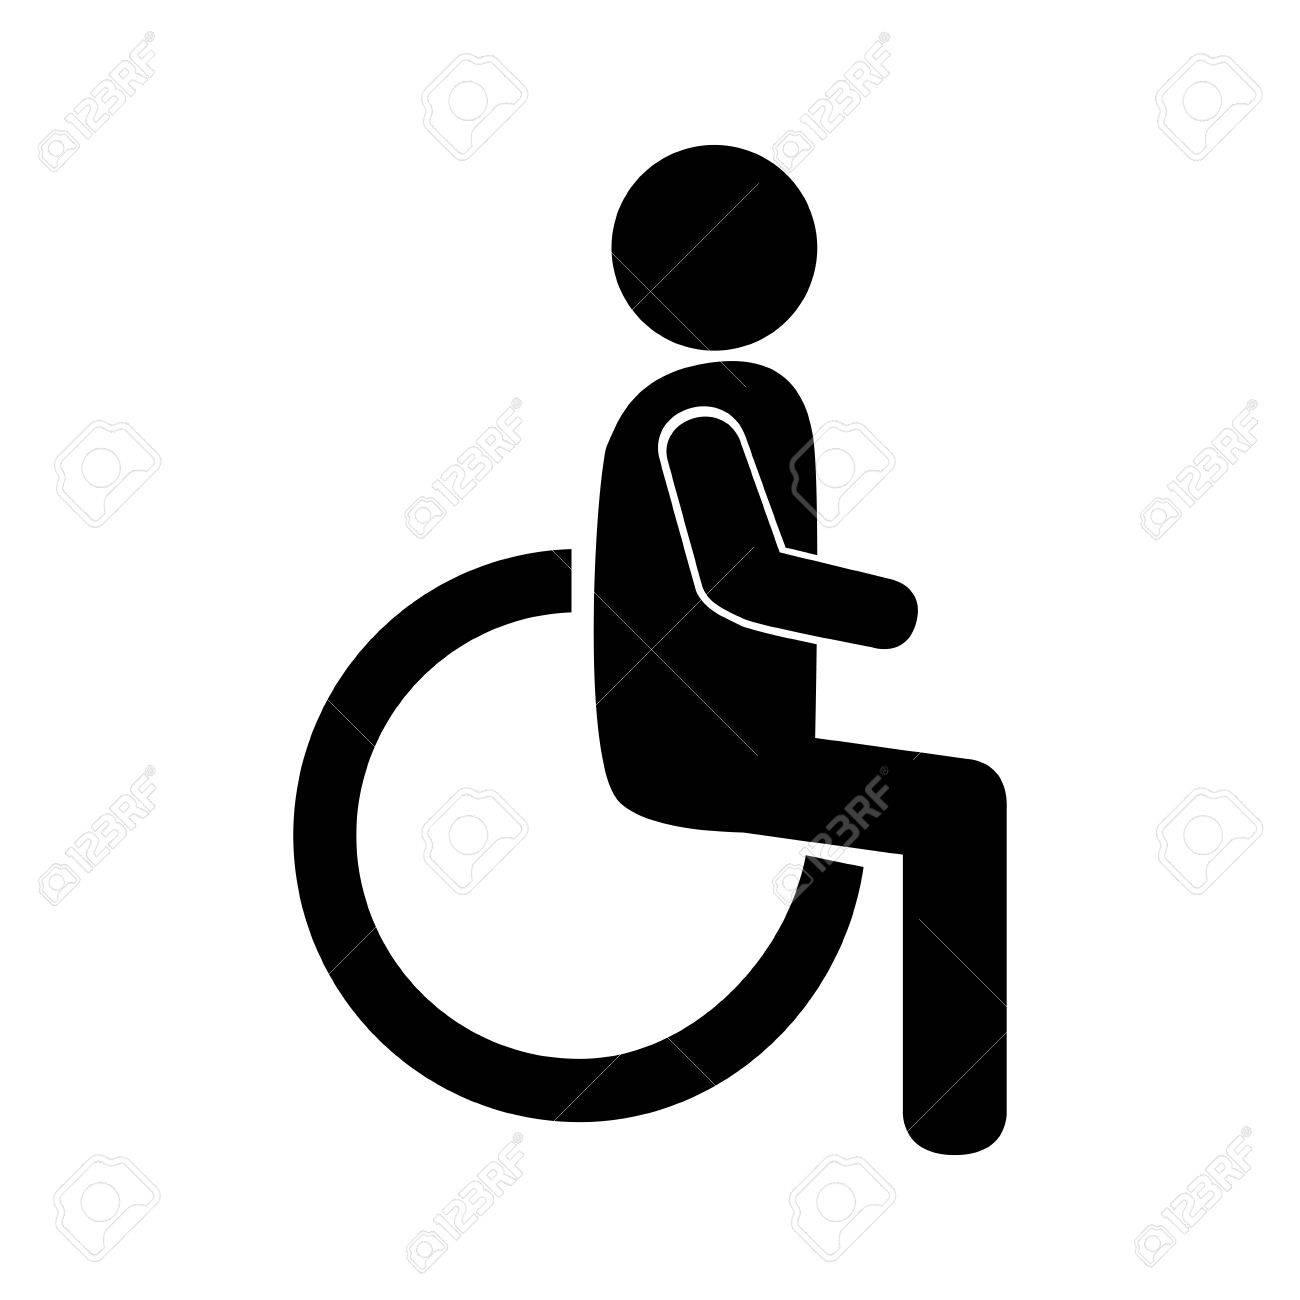 Signal Disability Chair Medical Health Wheelchair Assistance ...